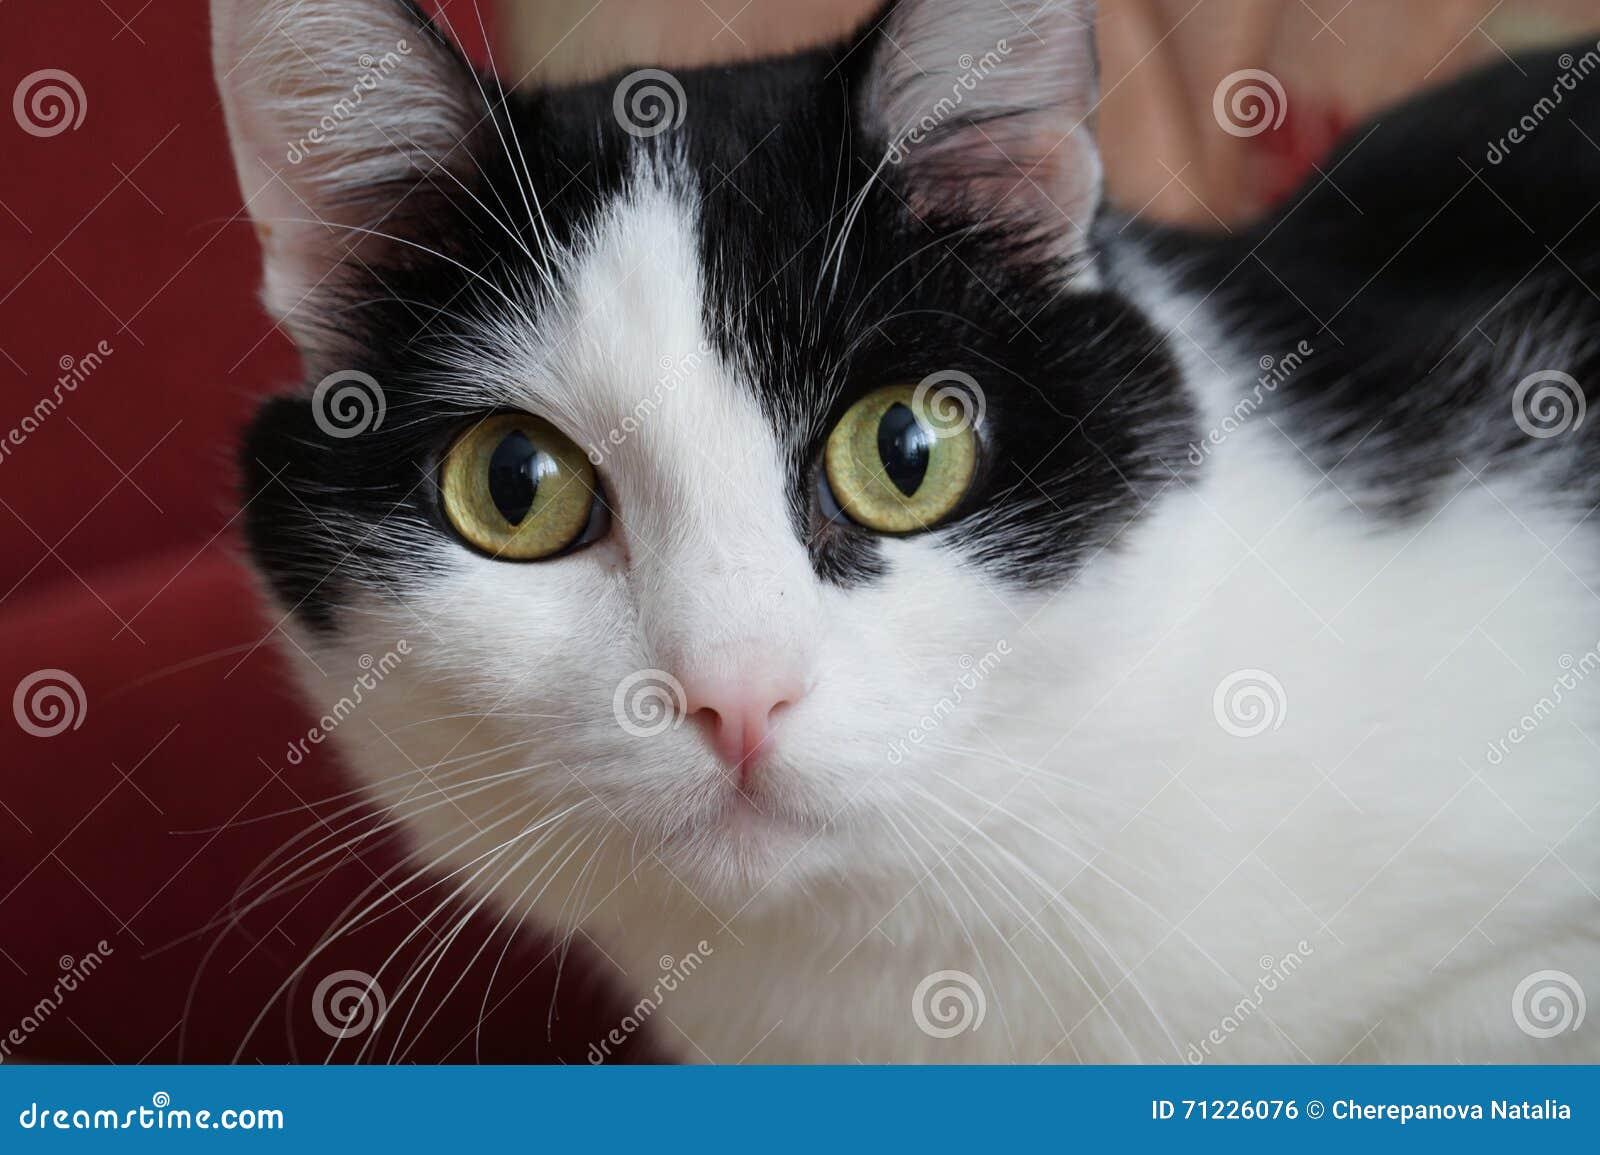 Gato Negro-blanco Foto De Archivo. Imagen De Gatos, Ojos